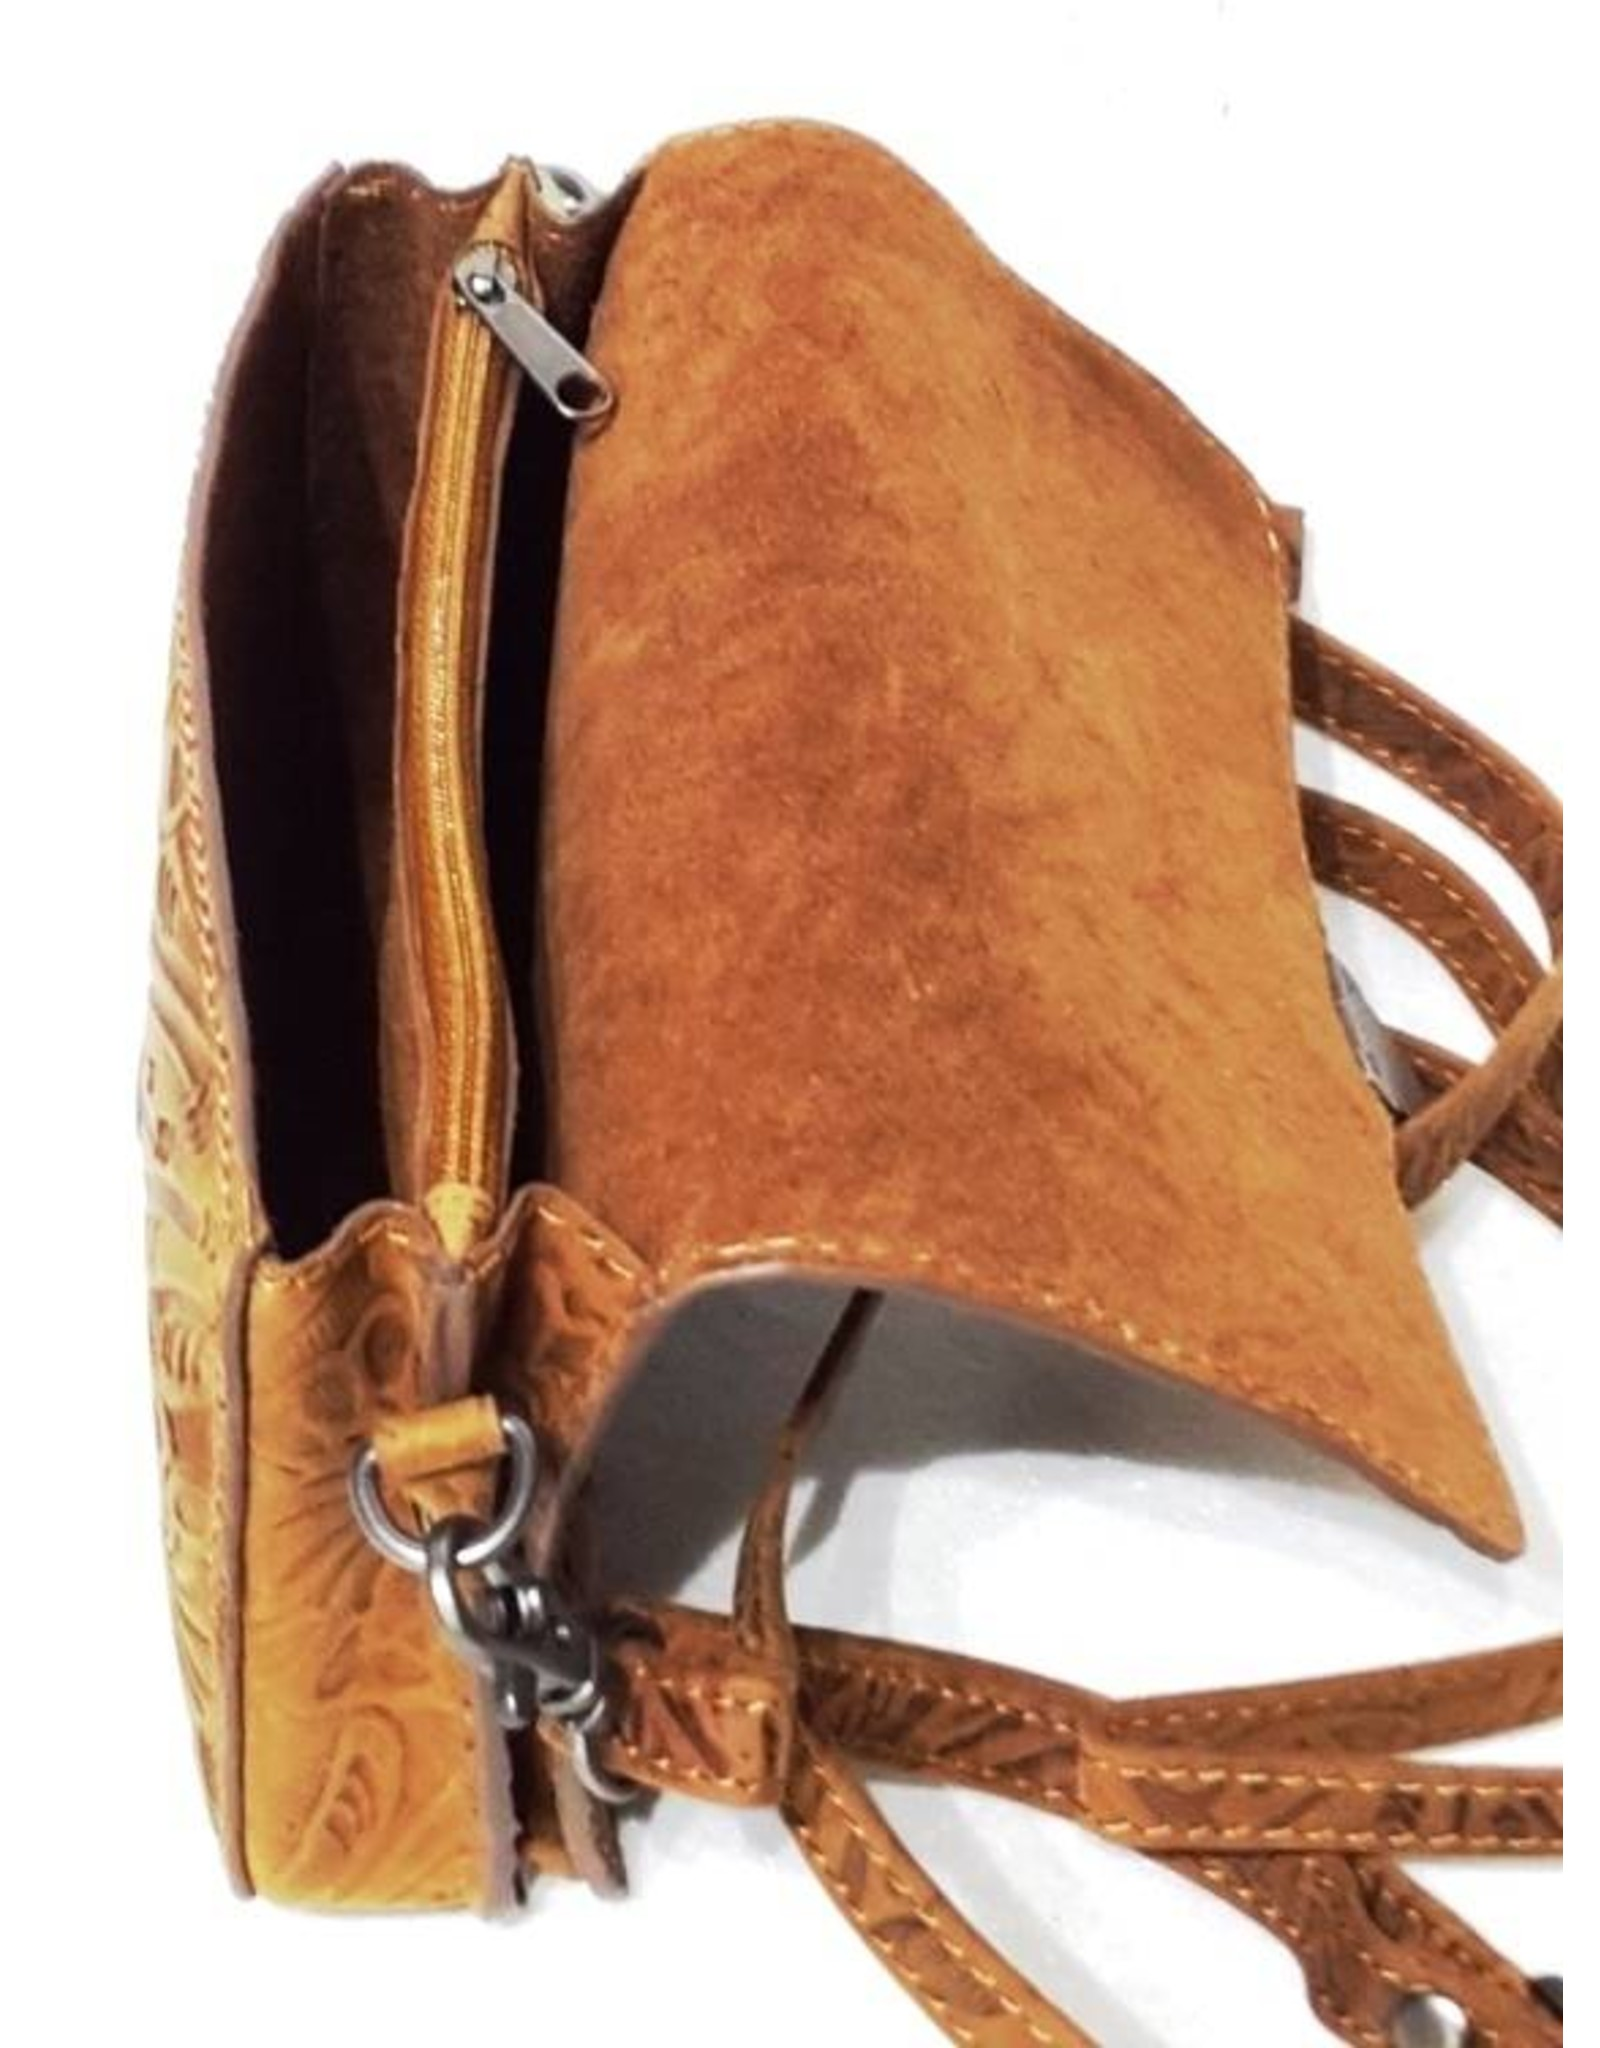 HillBurry Leather bags - Hillburry leather shoulderbag 3279f-ta